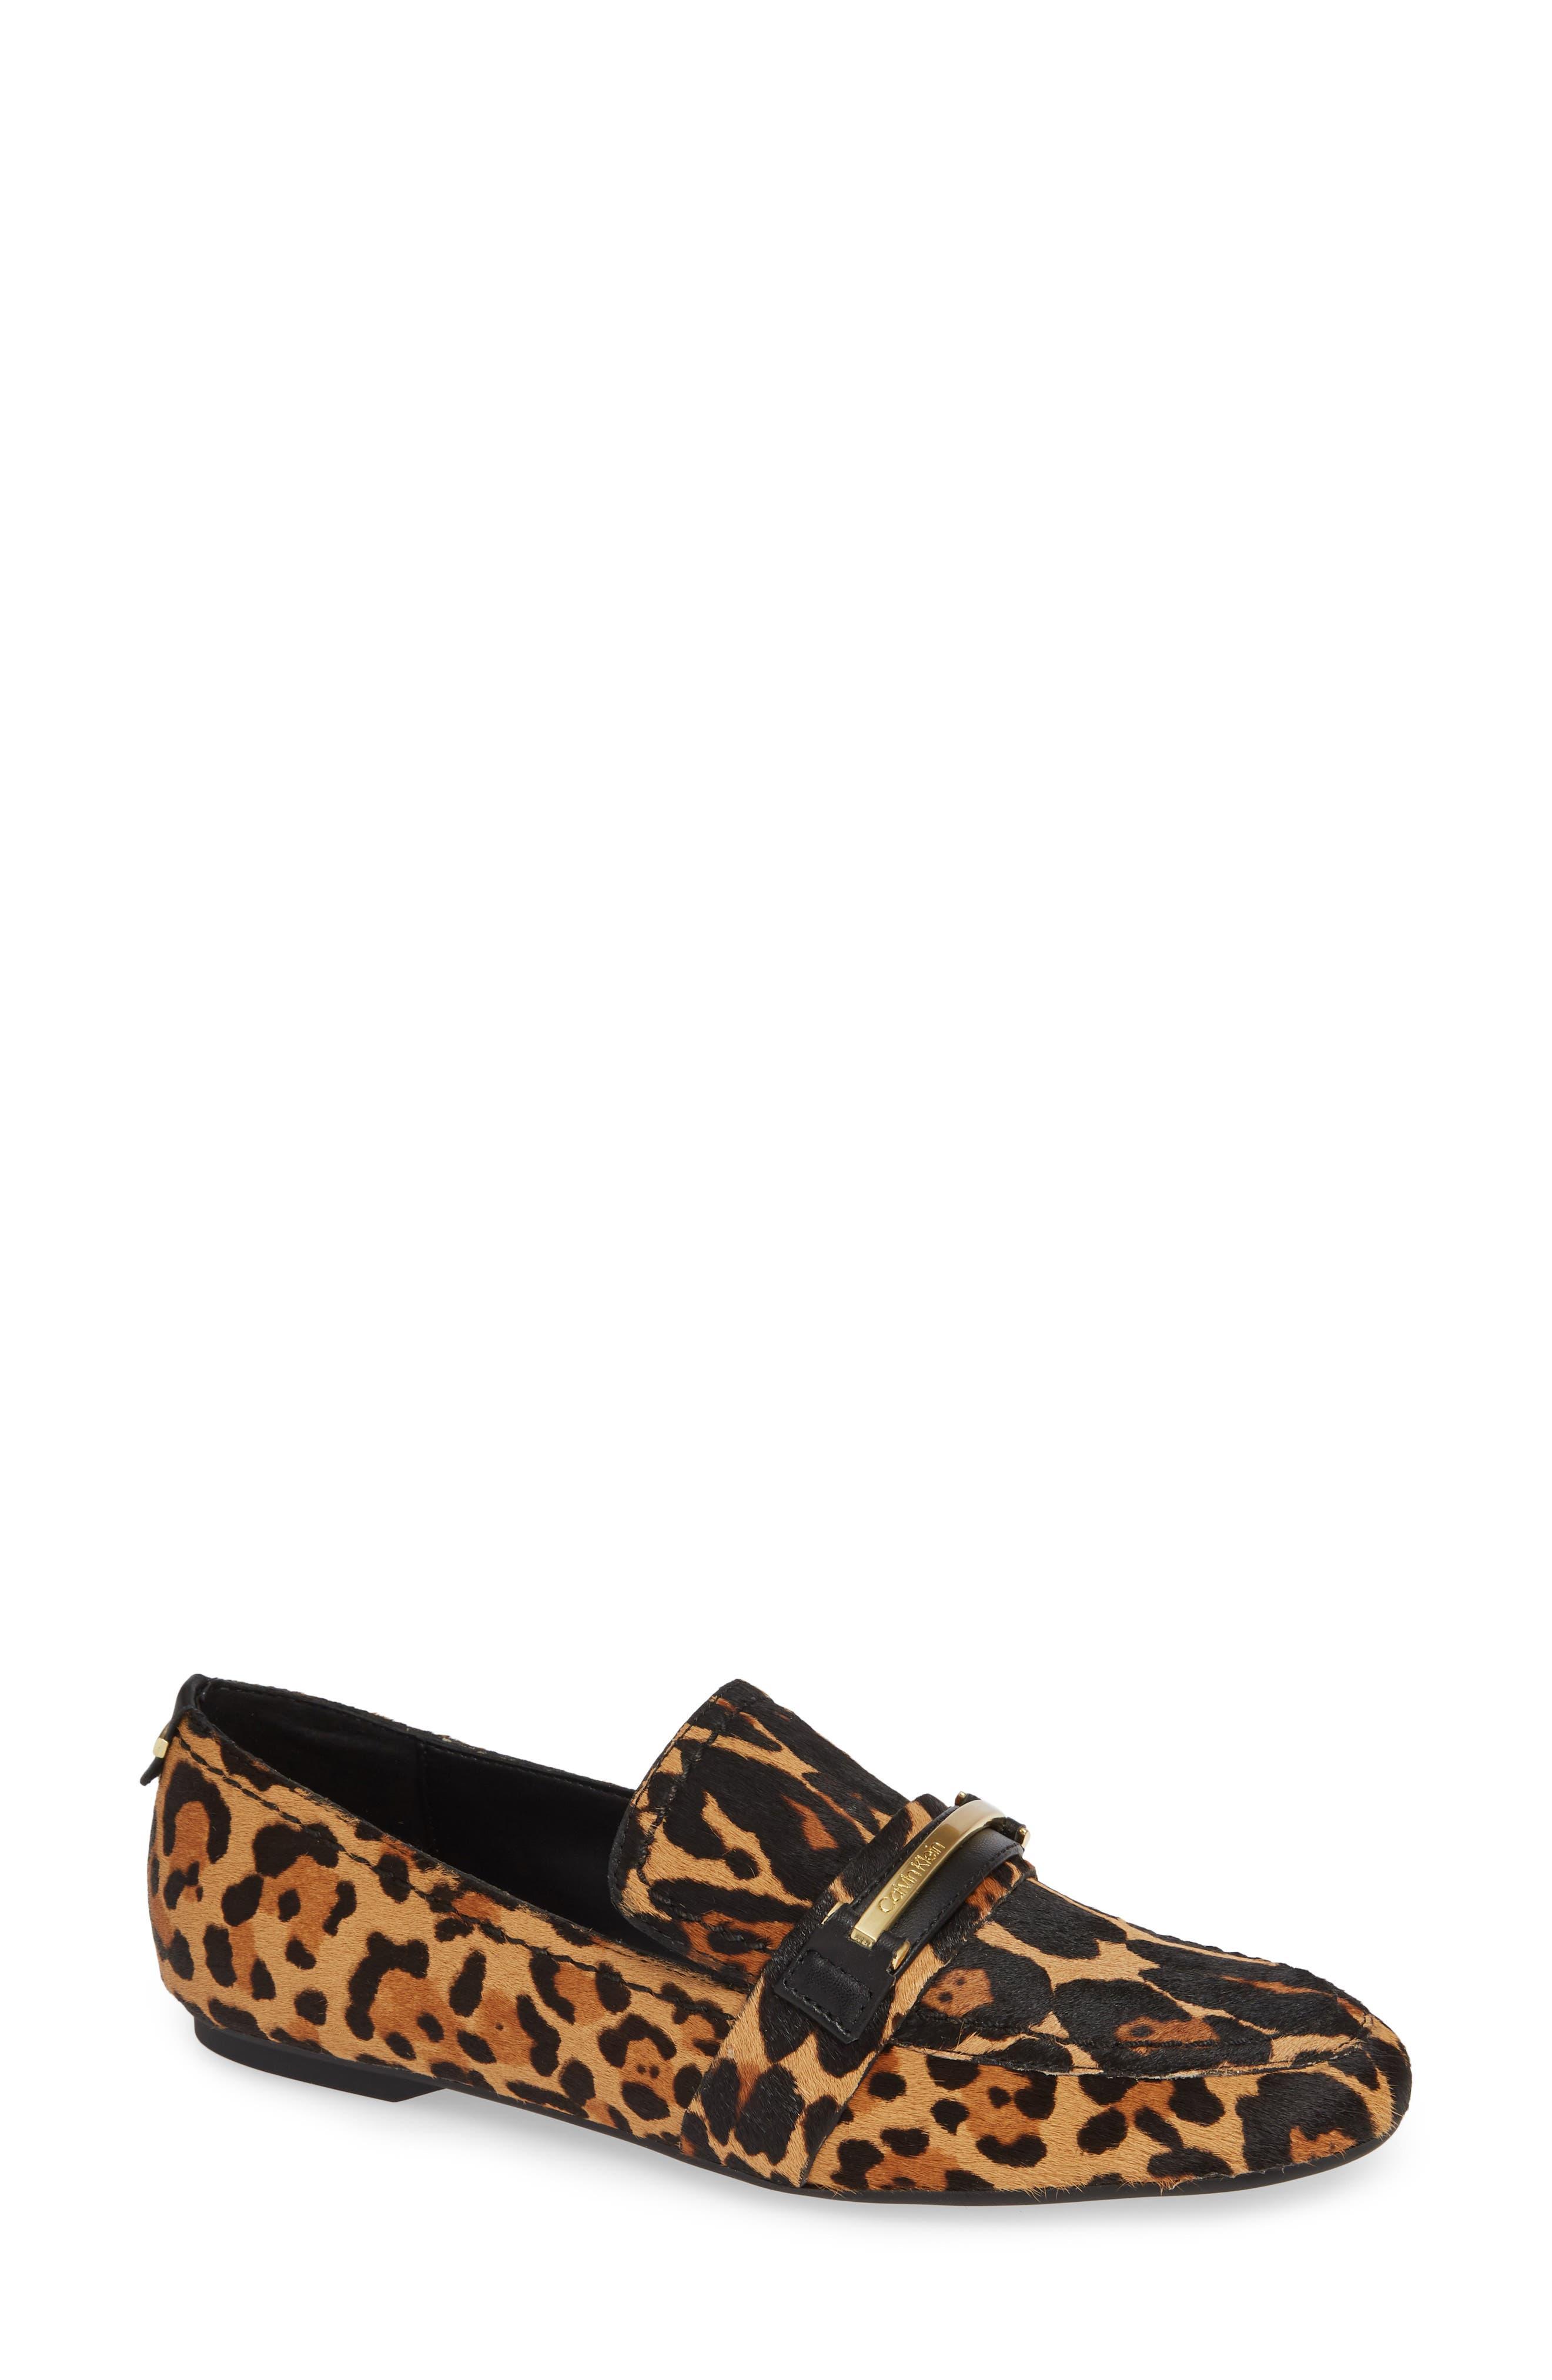 Orianna Genuine Calf Hair Loafer, Main, color, LEOPARD CALF HAIR